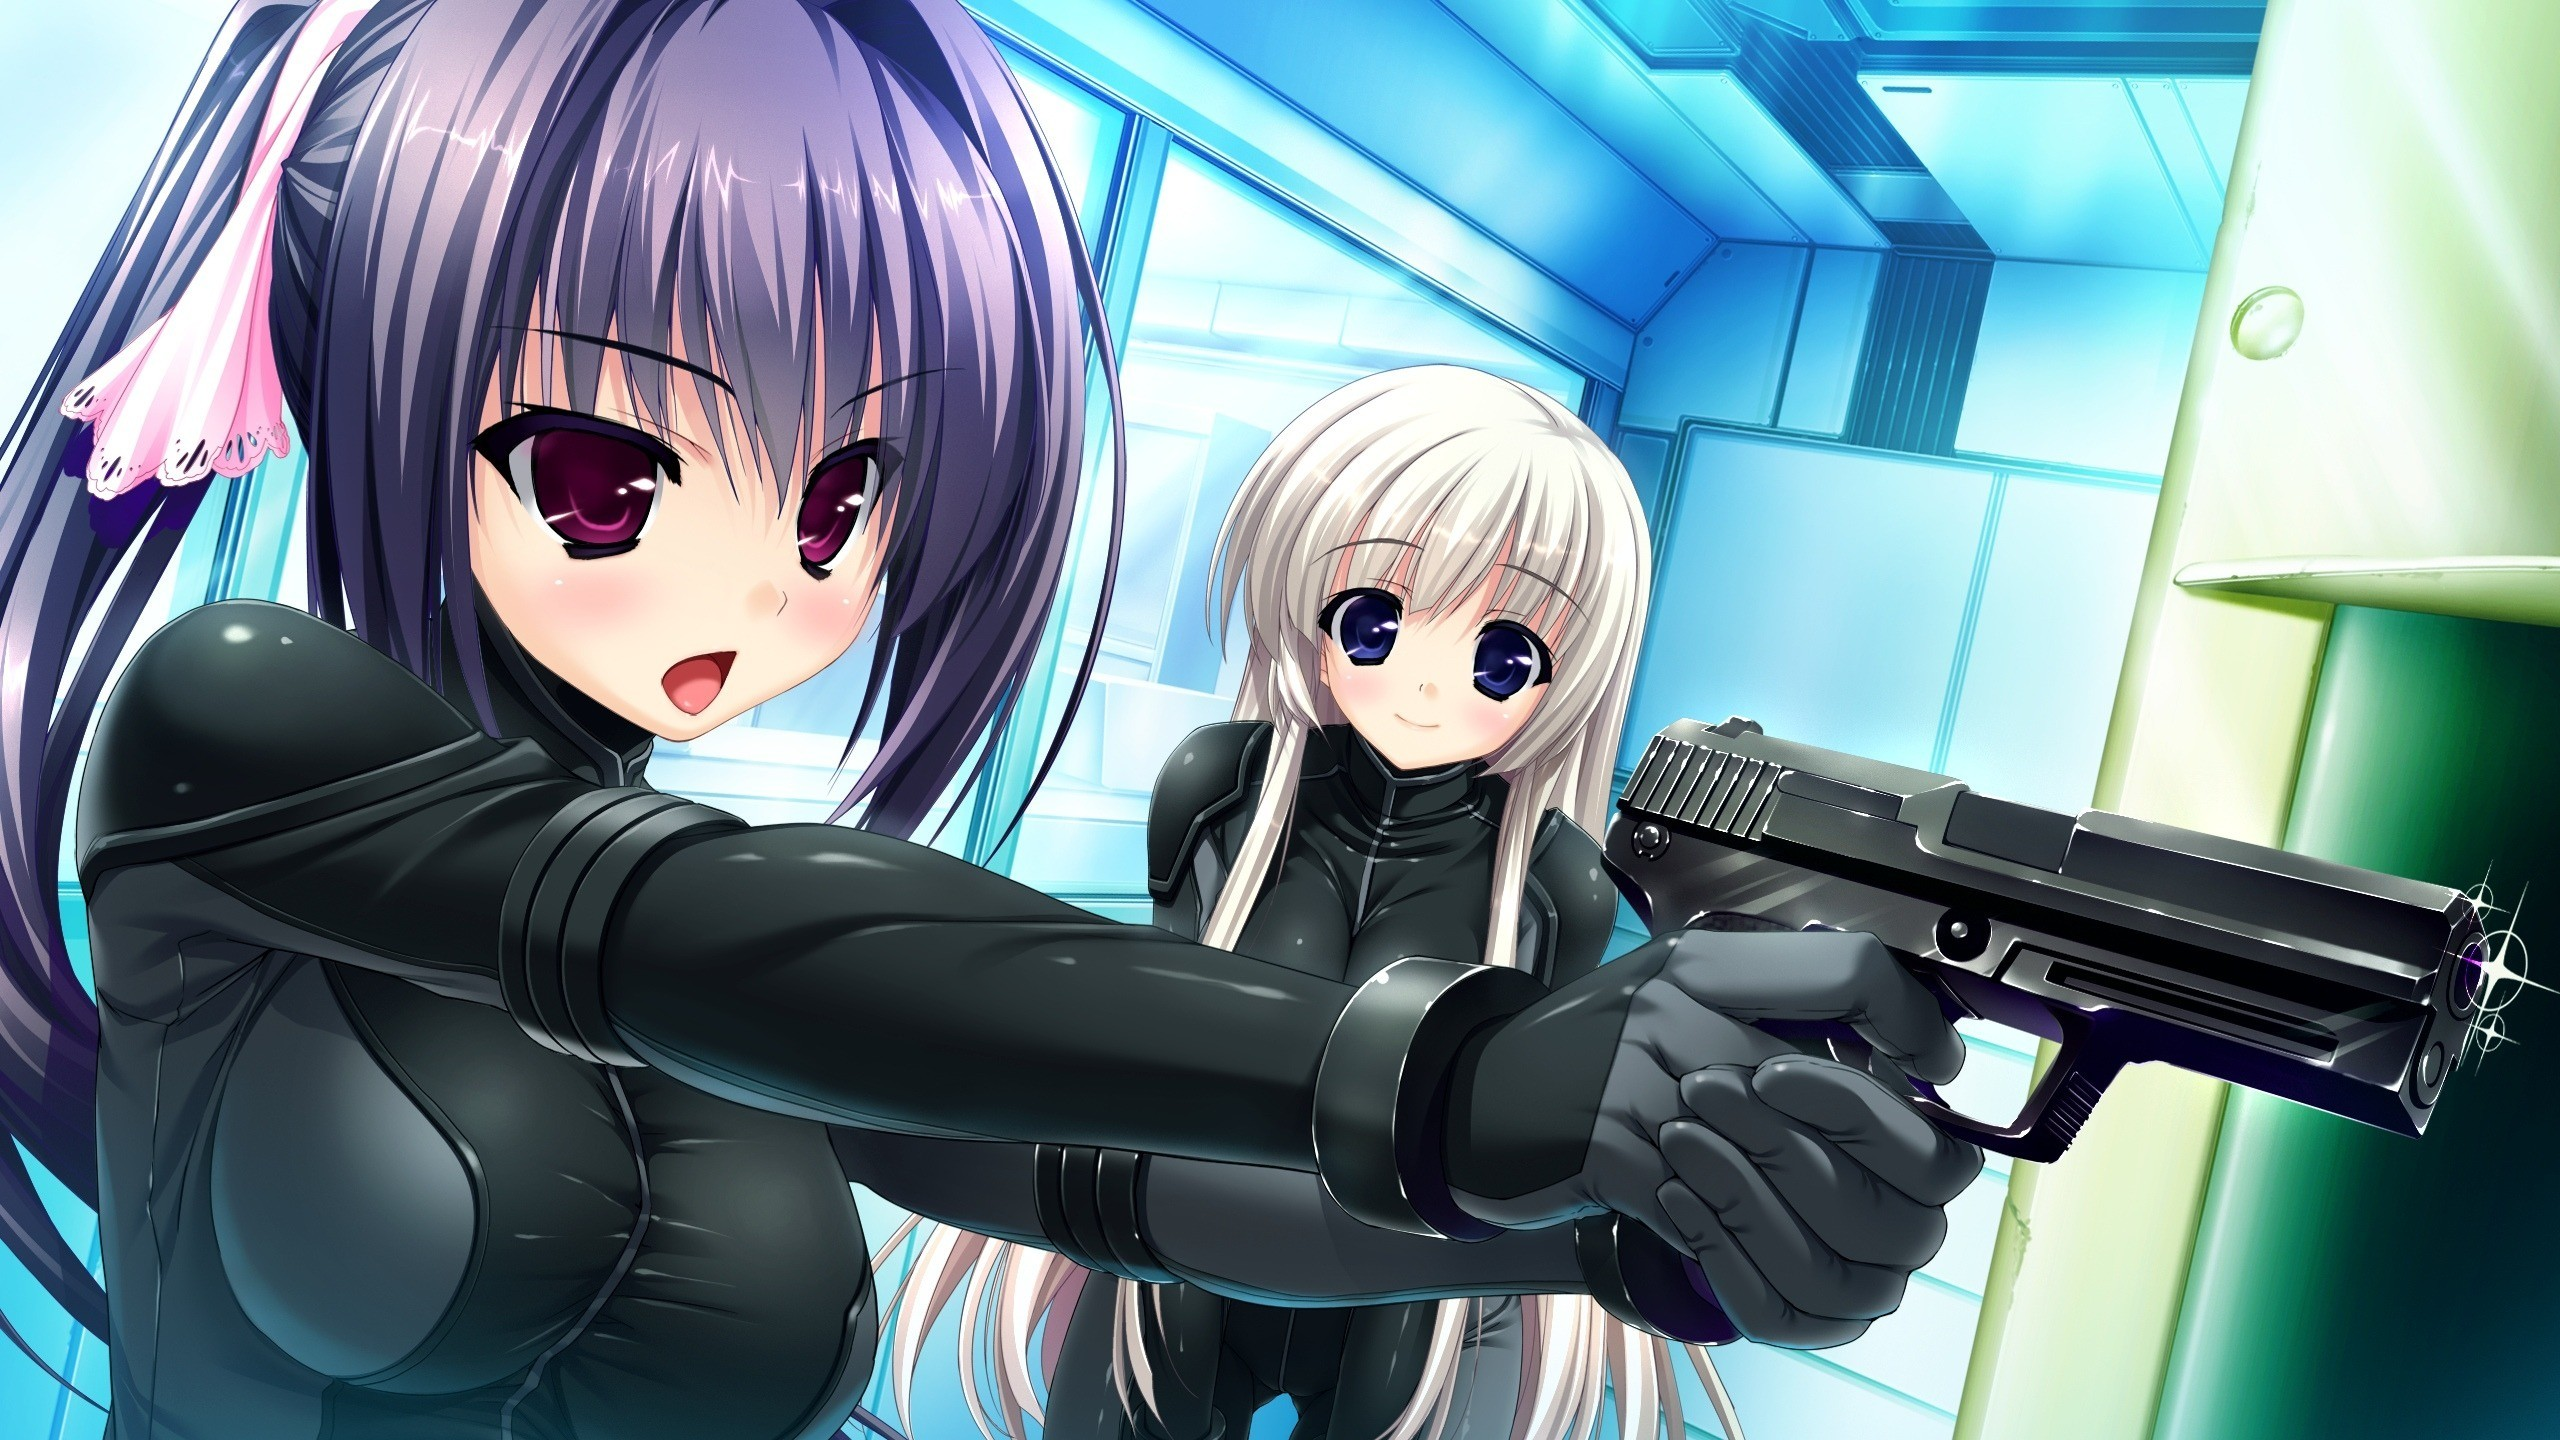 Photo Pistols Girls Anime Hands 2560×1440